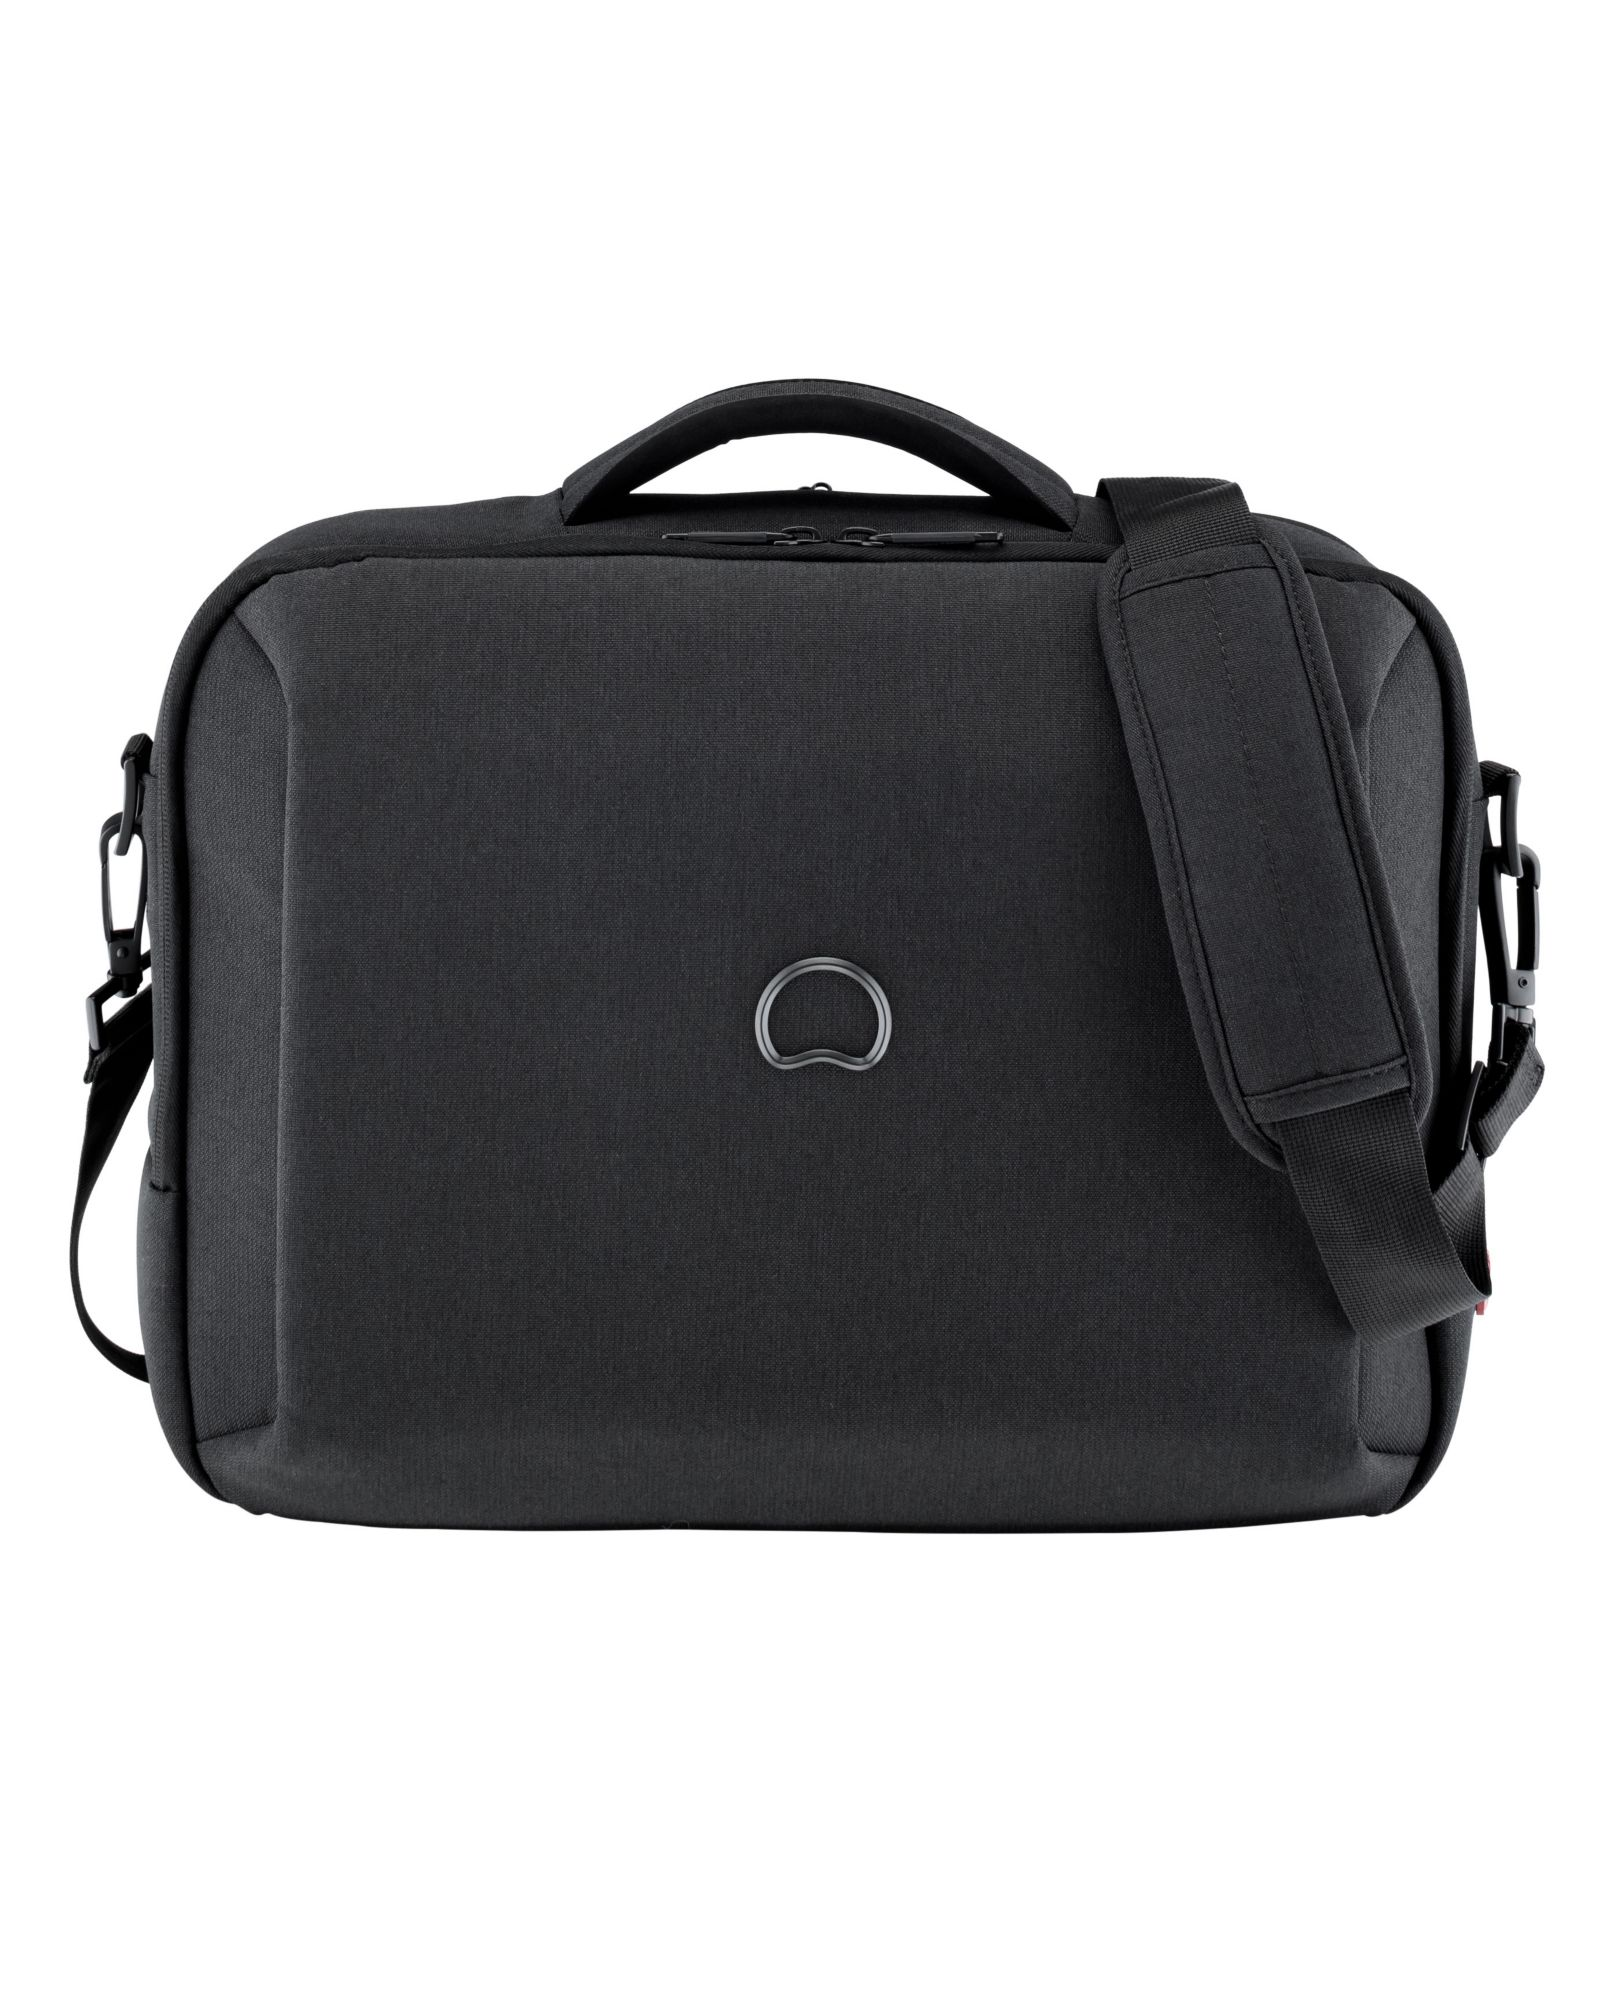 DELSEY  Businesstasche mit 15,6-Zoll Laptopfach, »Mouvement«